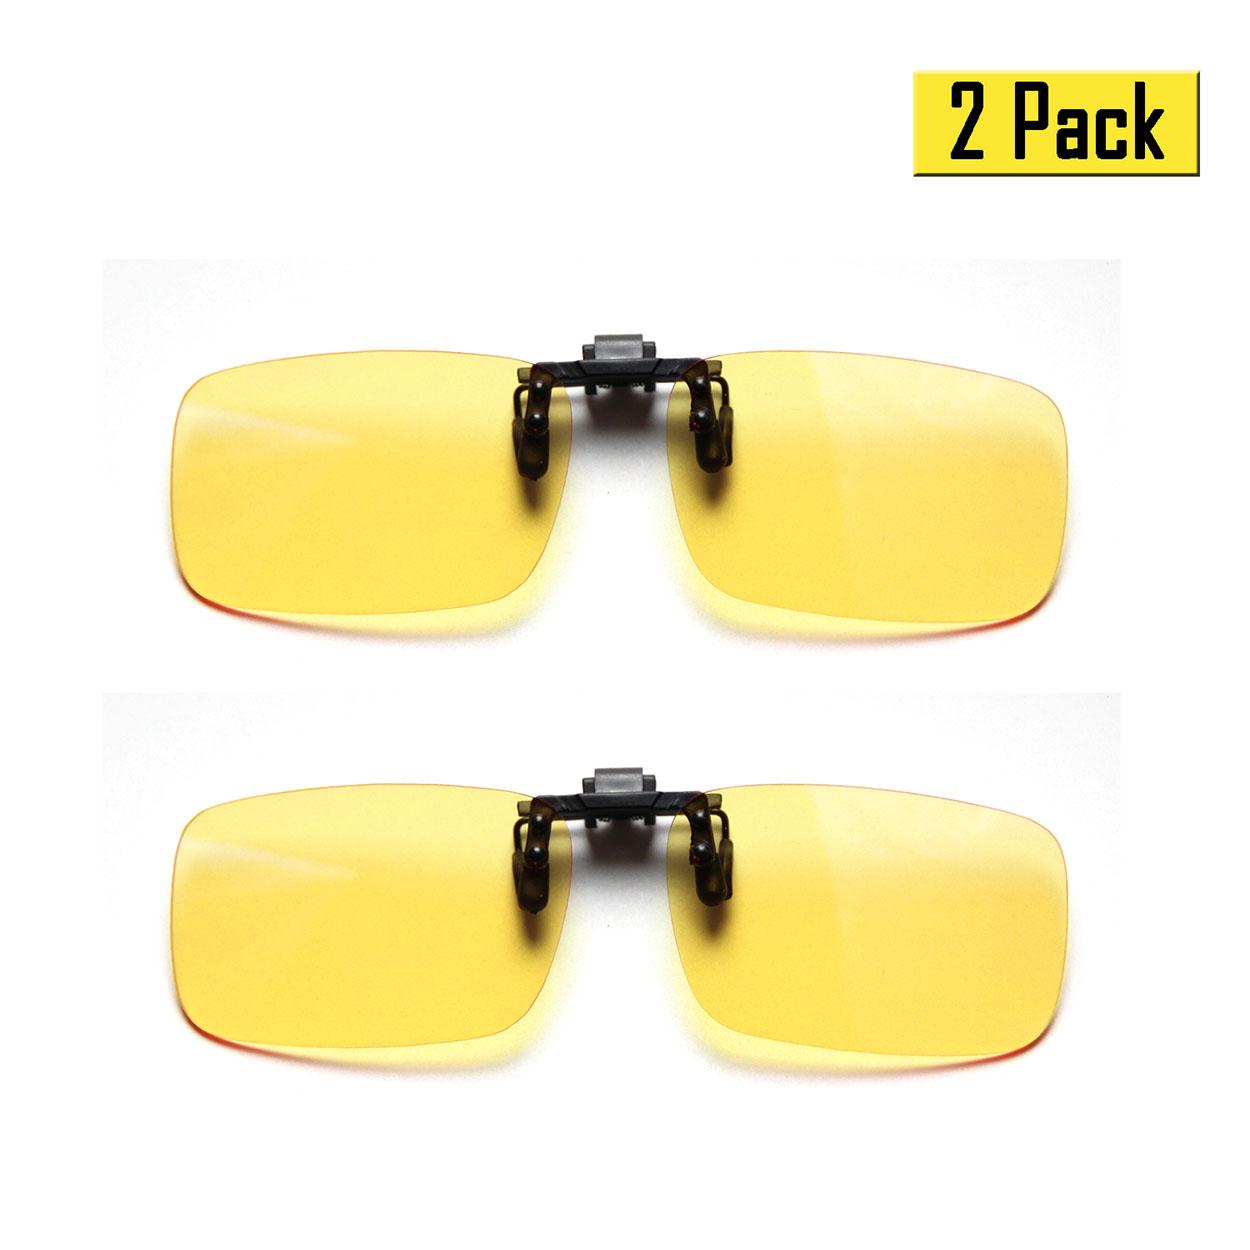 Cyxus Clip-On Blue Light Blocking Computer Glasses, Reduce Eye Strain UV400, 2 Standard Size in a pack